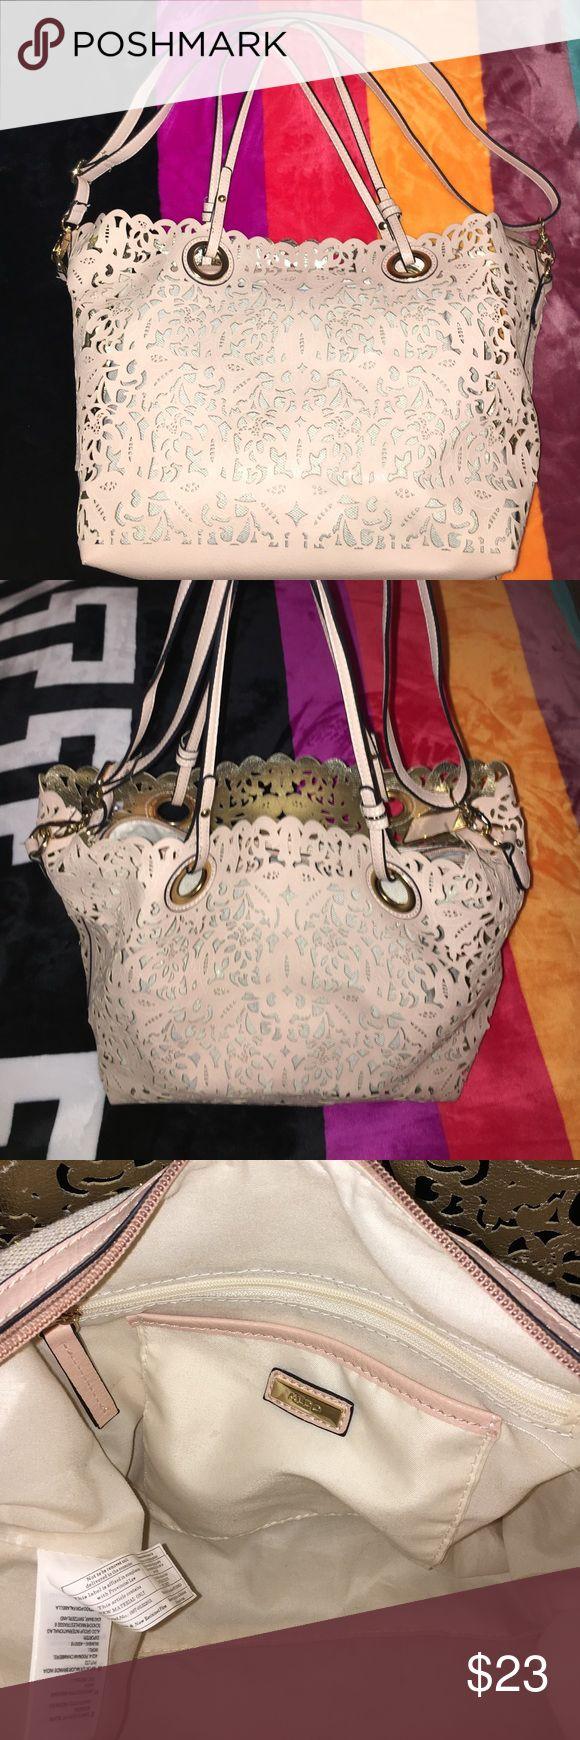 ALDO Purse Like New only used once light mark on bottom of purse. Aldo Bags Shoulder Bags